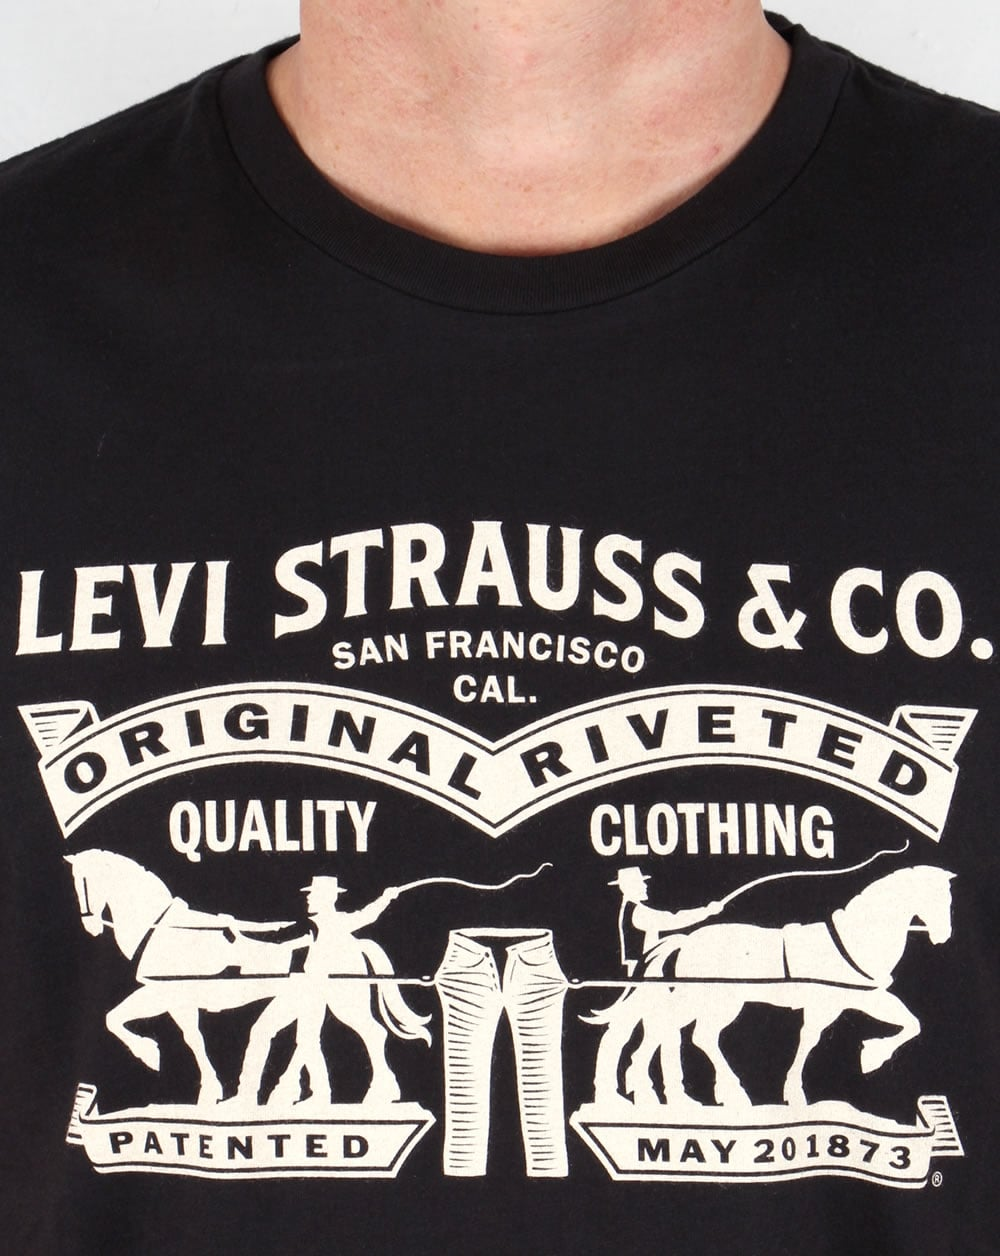 Levis Strauss Co Logo T Shirt Black Originals Tee Mens